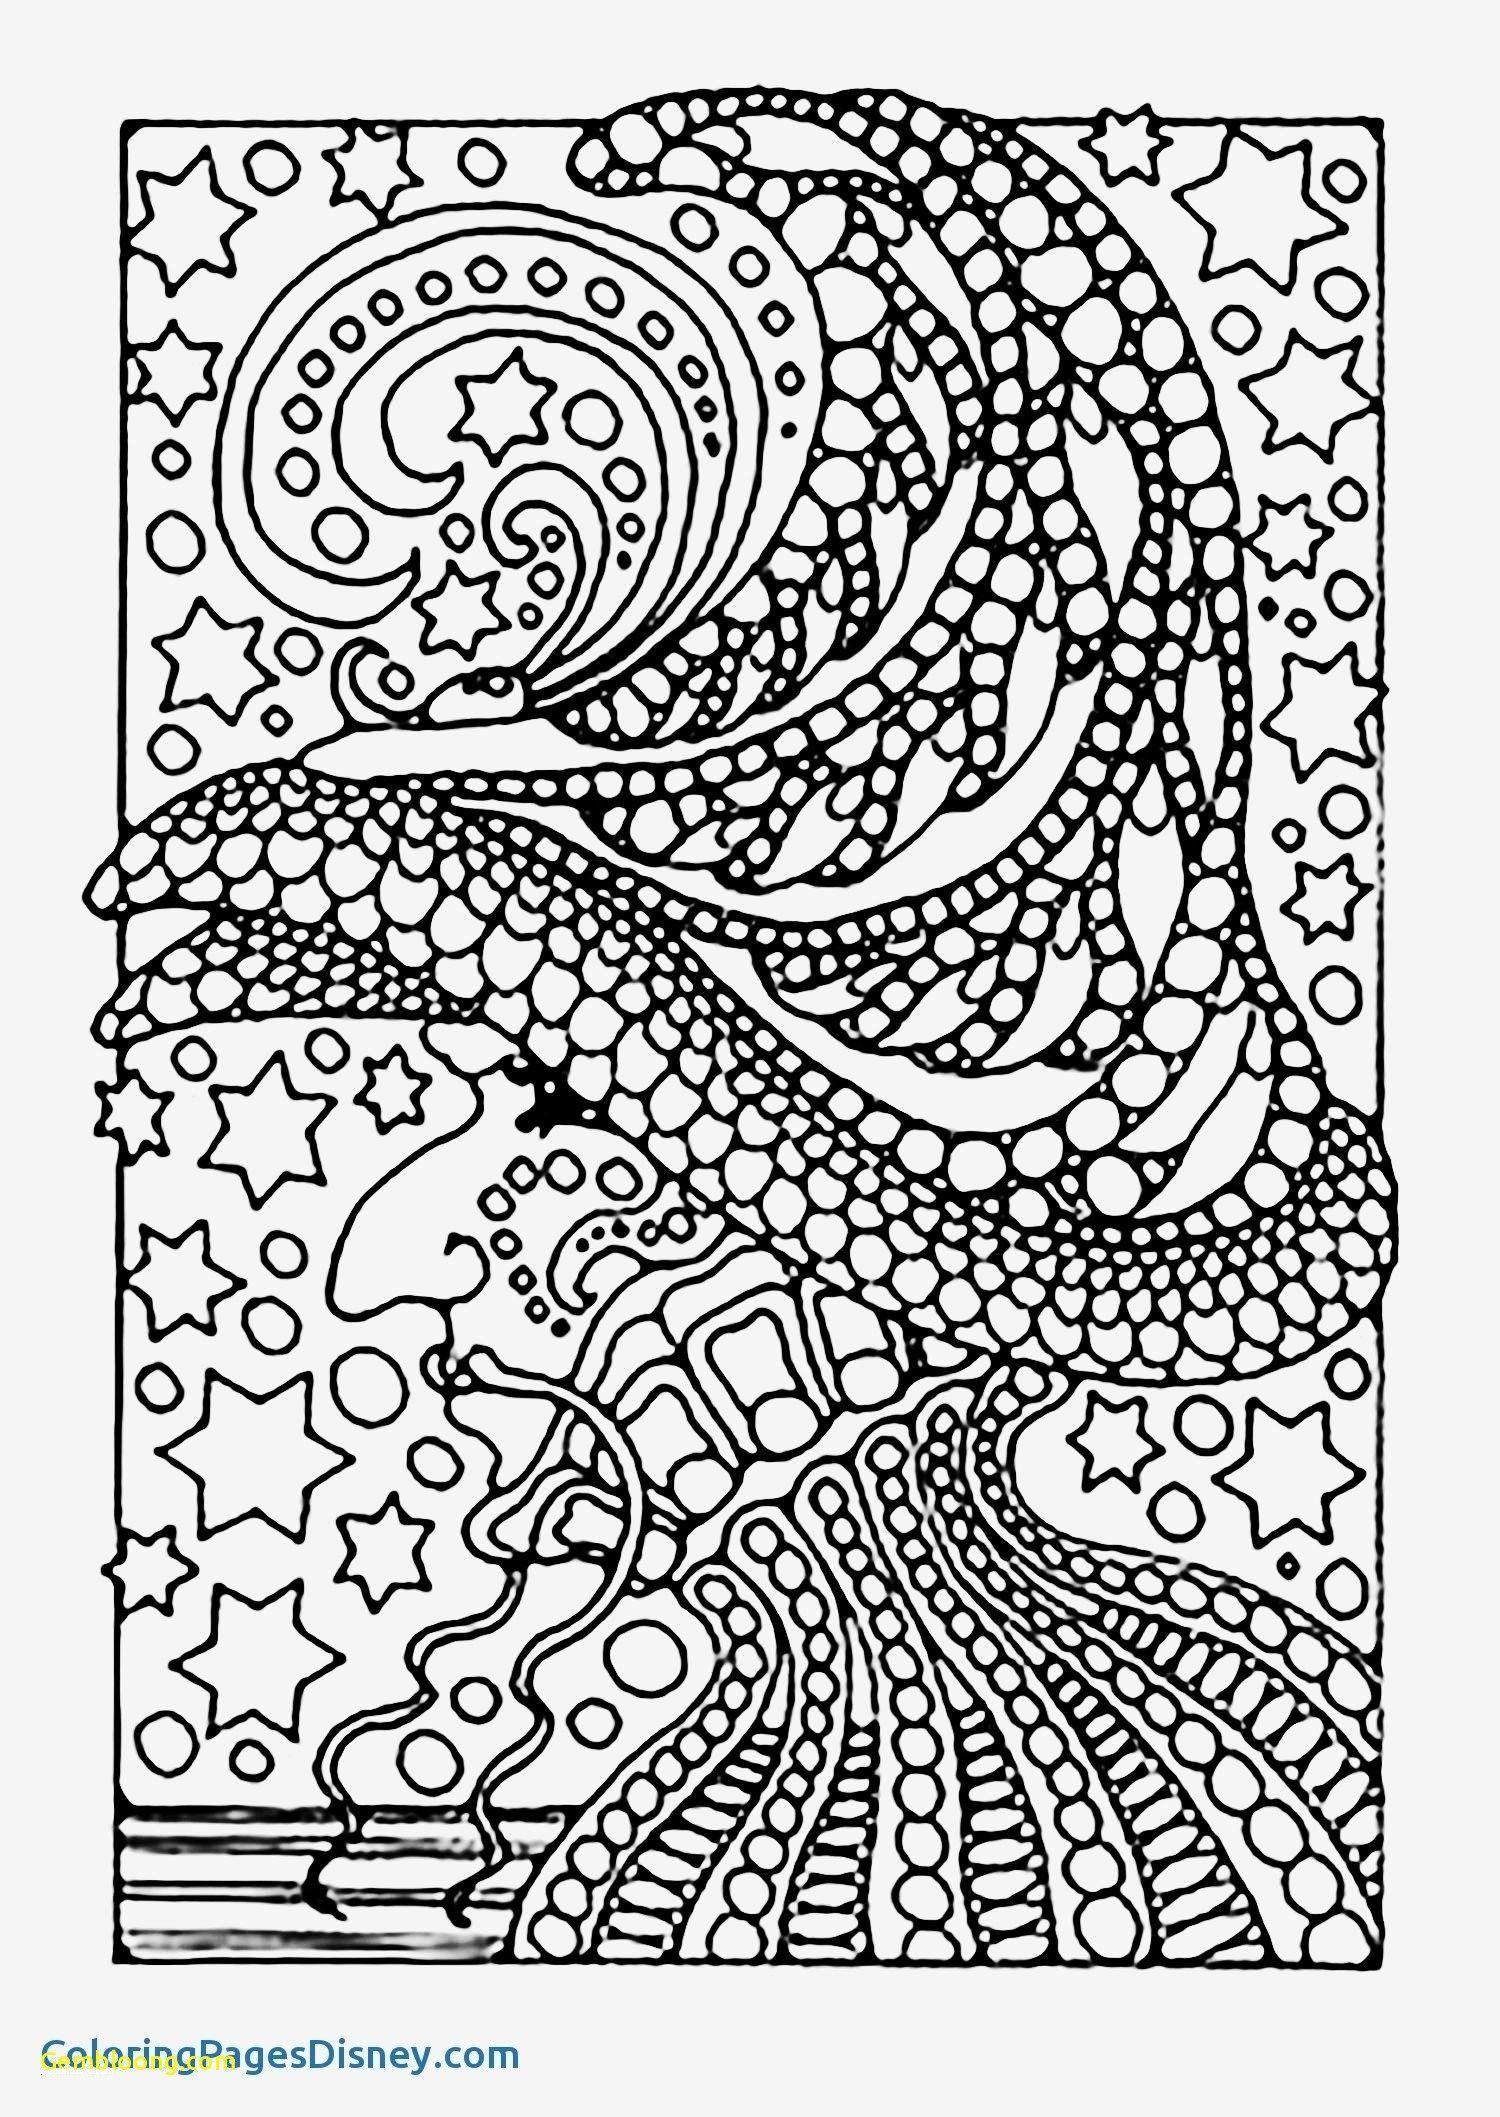 Advanced Mandala Coloring Pages Beautiful Coloring Pages Intricate Coloring Pages Pdf In 2020 Witch Coloring Pages Coloring Pages Inspirational Mandala Coloring Pages